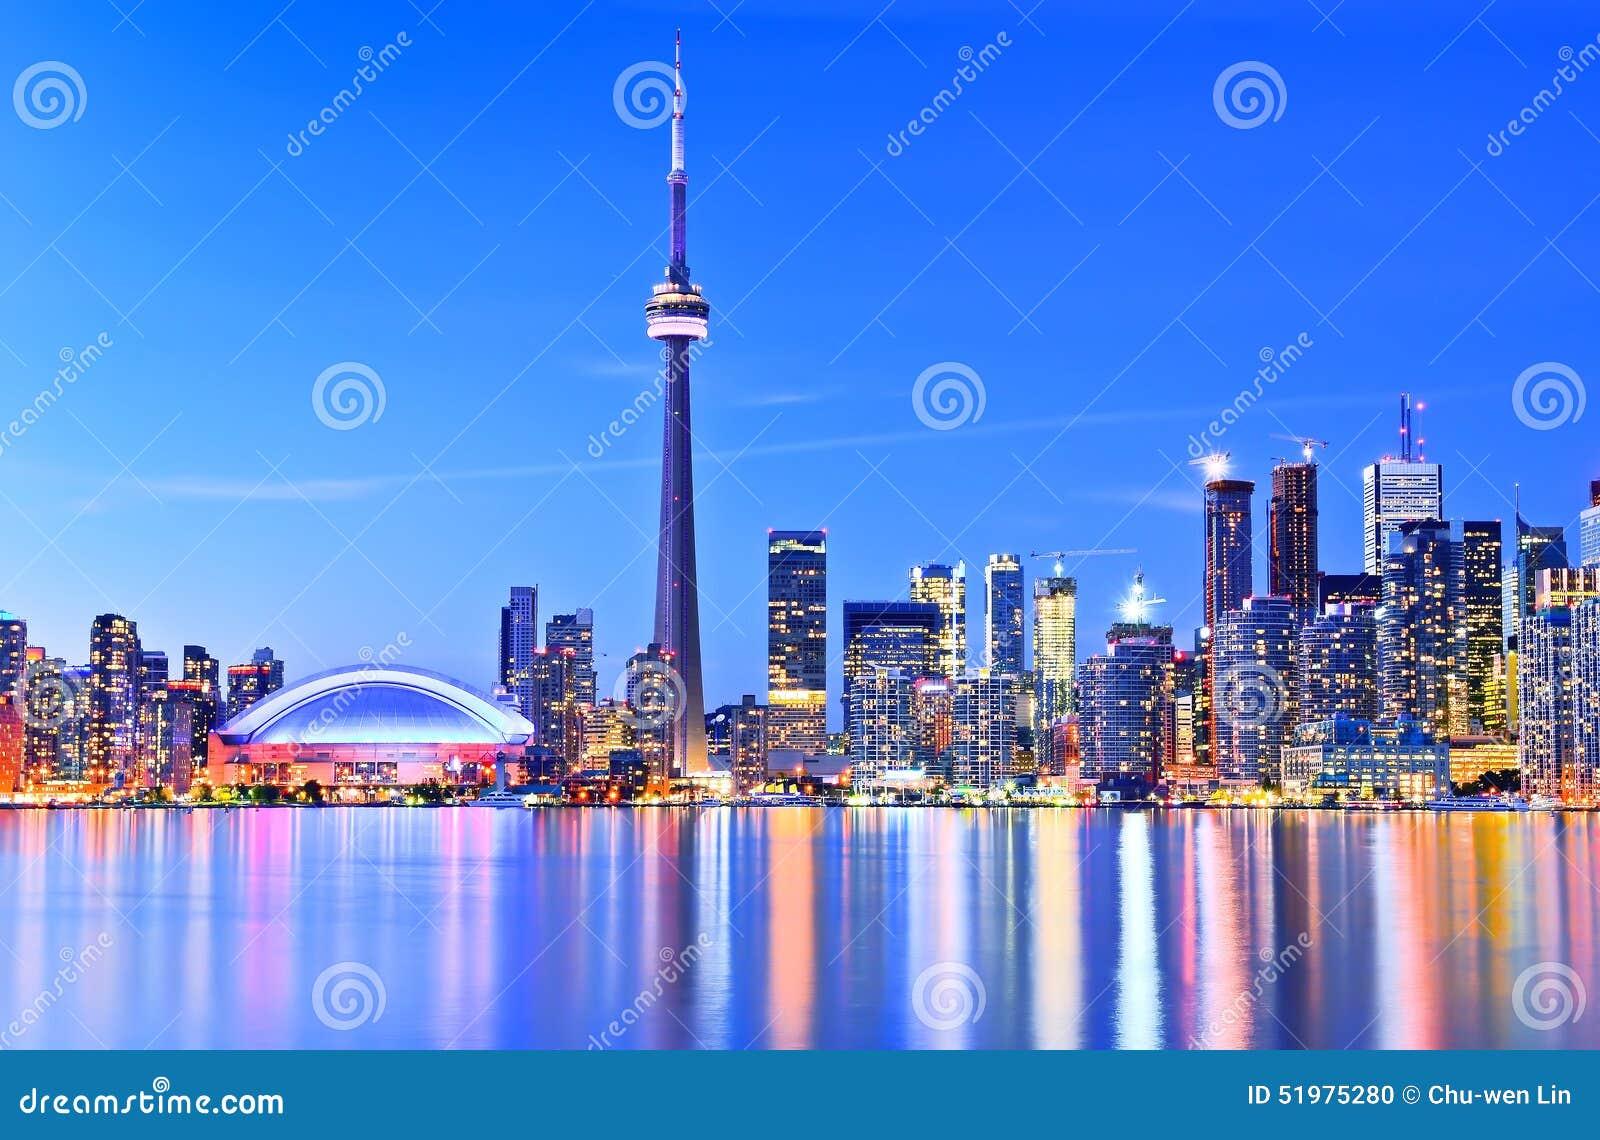 Toronto skyline in Ontario, Canada.